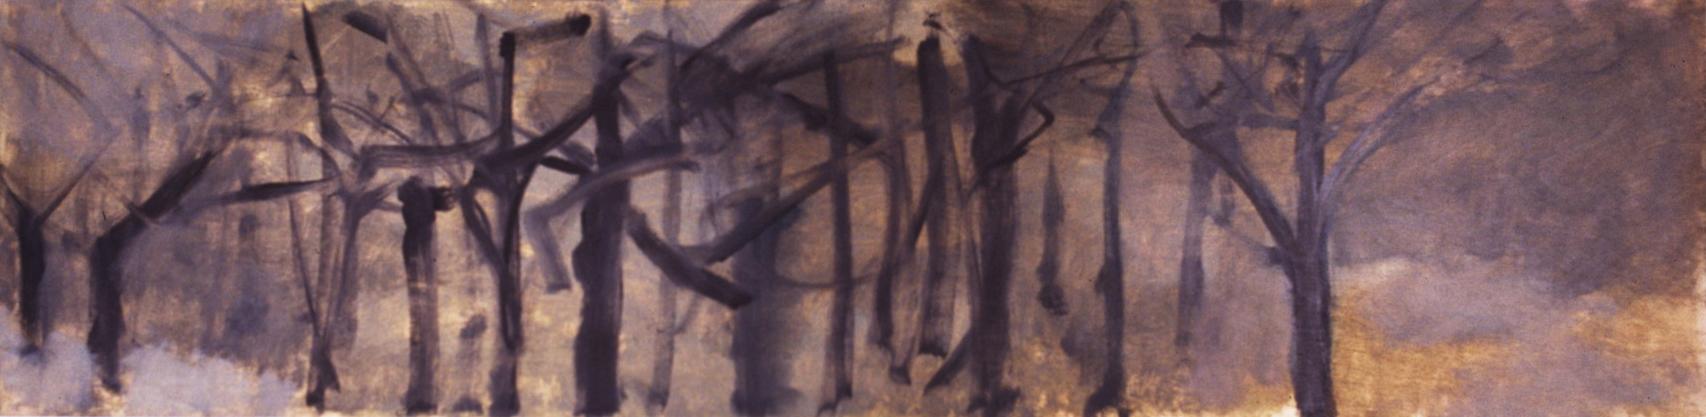 WET WOODS- oil on panel- 12 x 48- 1990